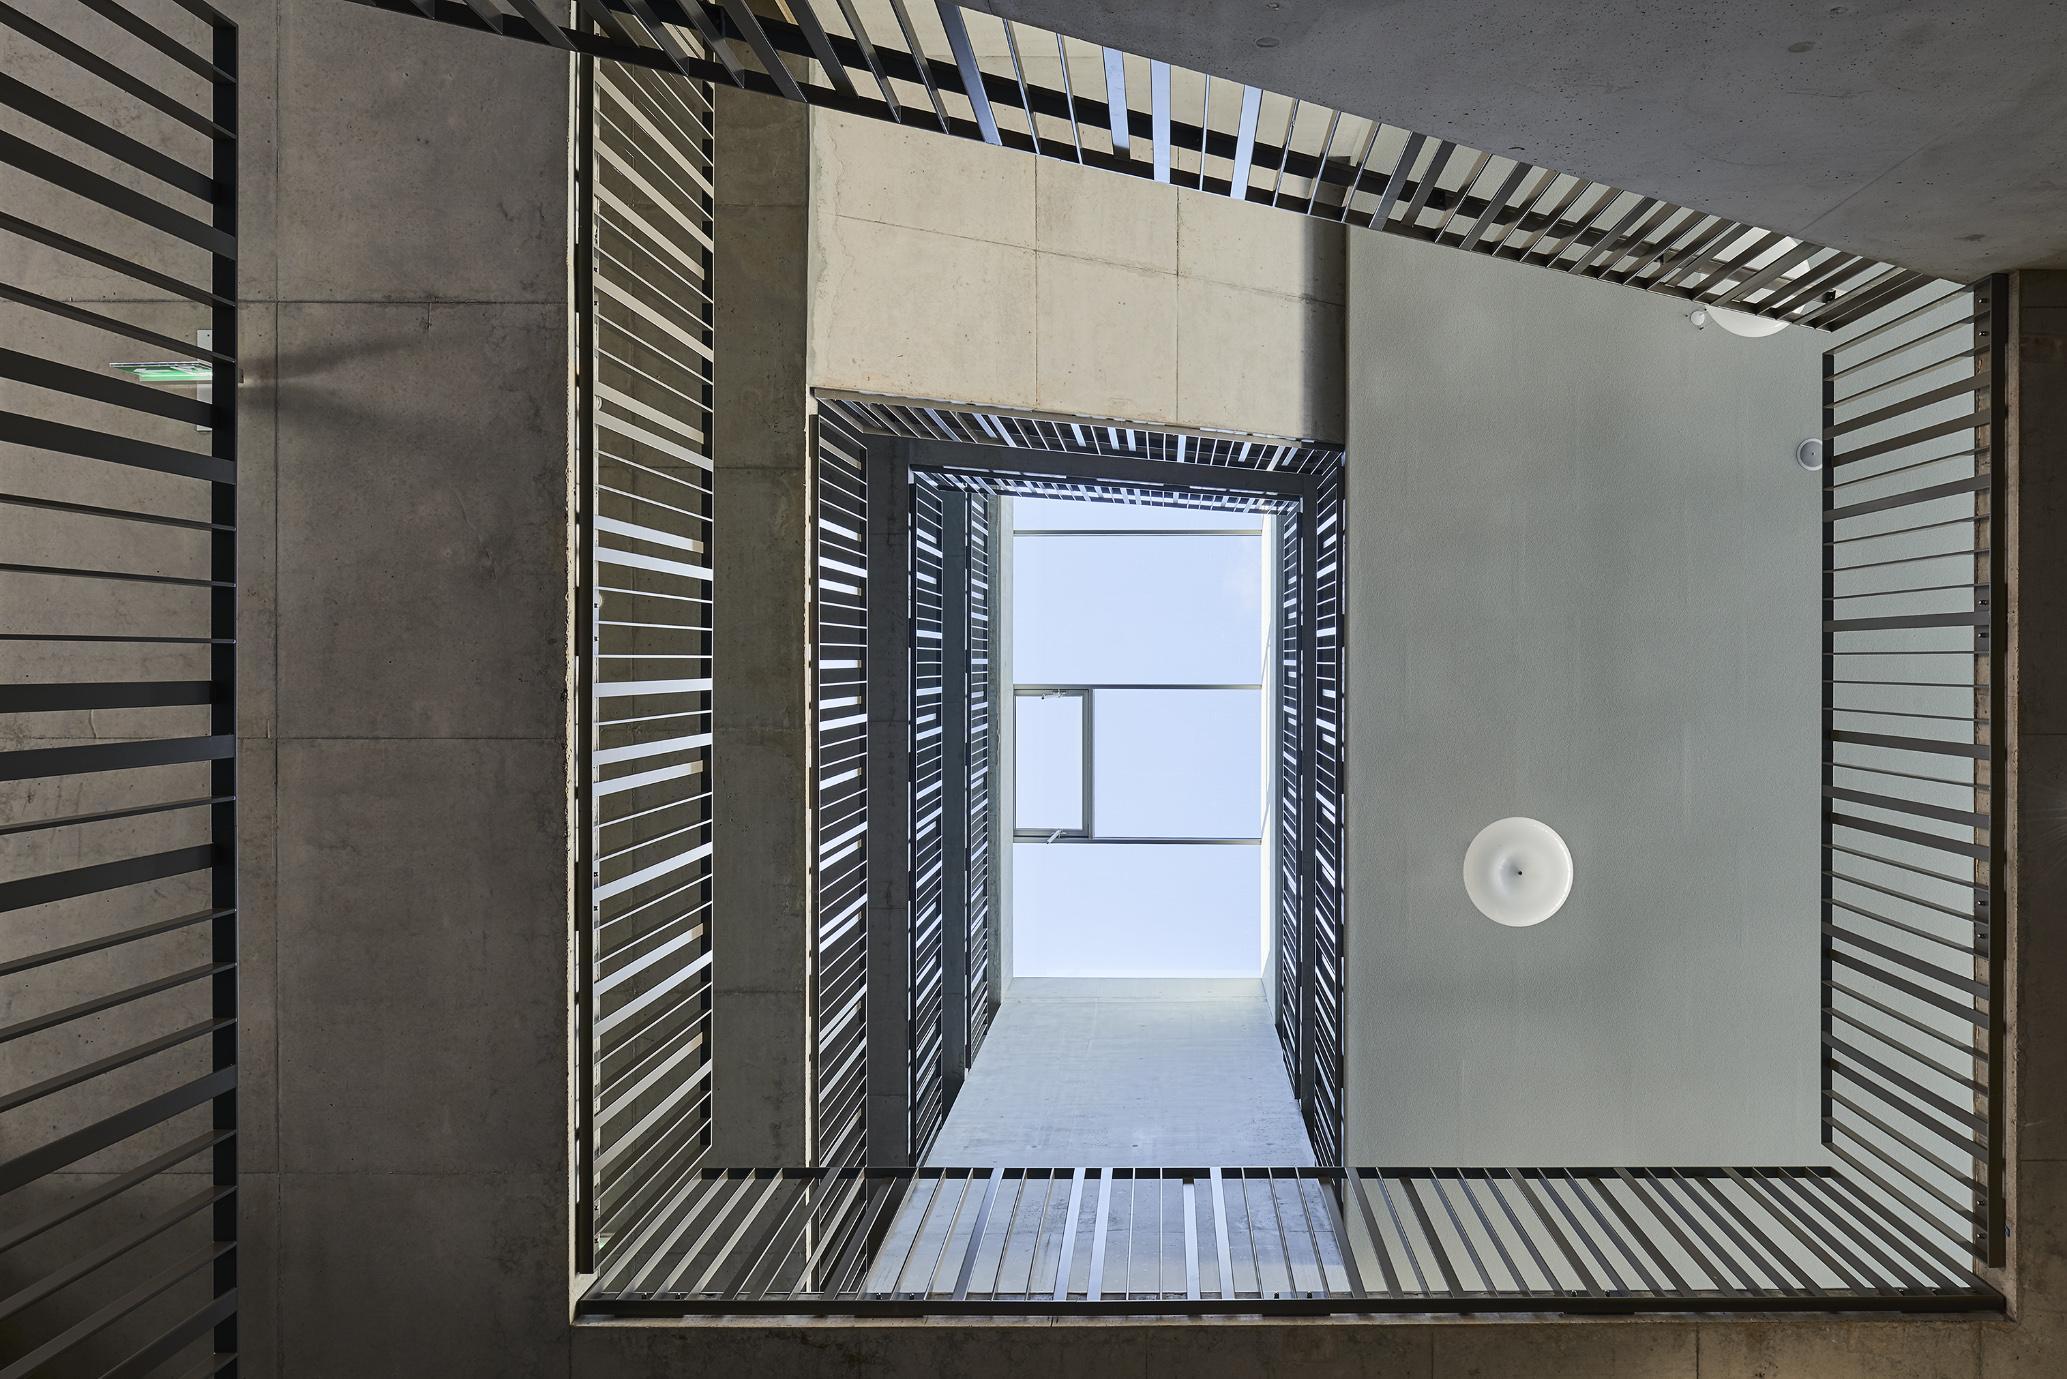 dettling péléraux architectes_001.jpg